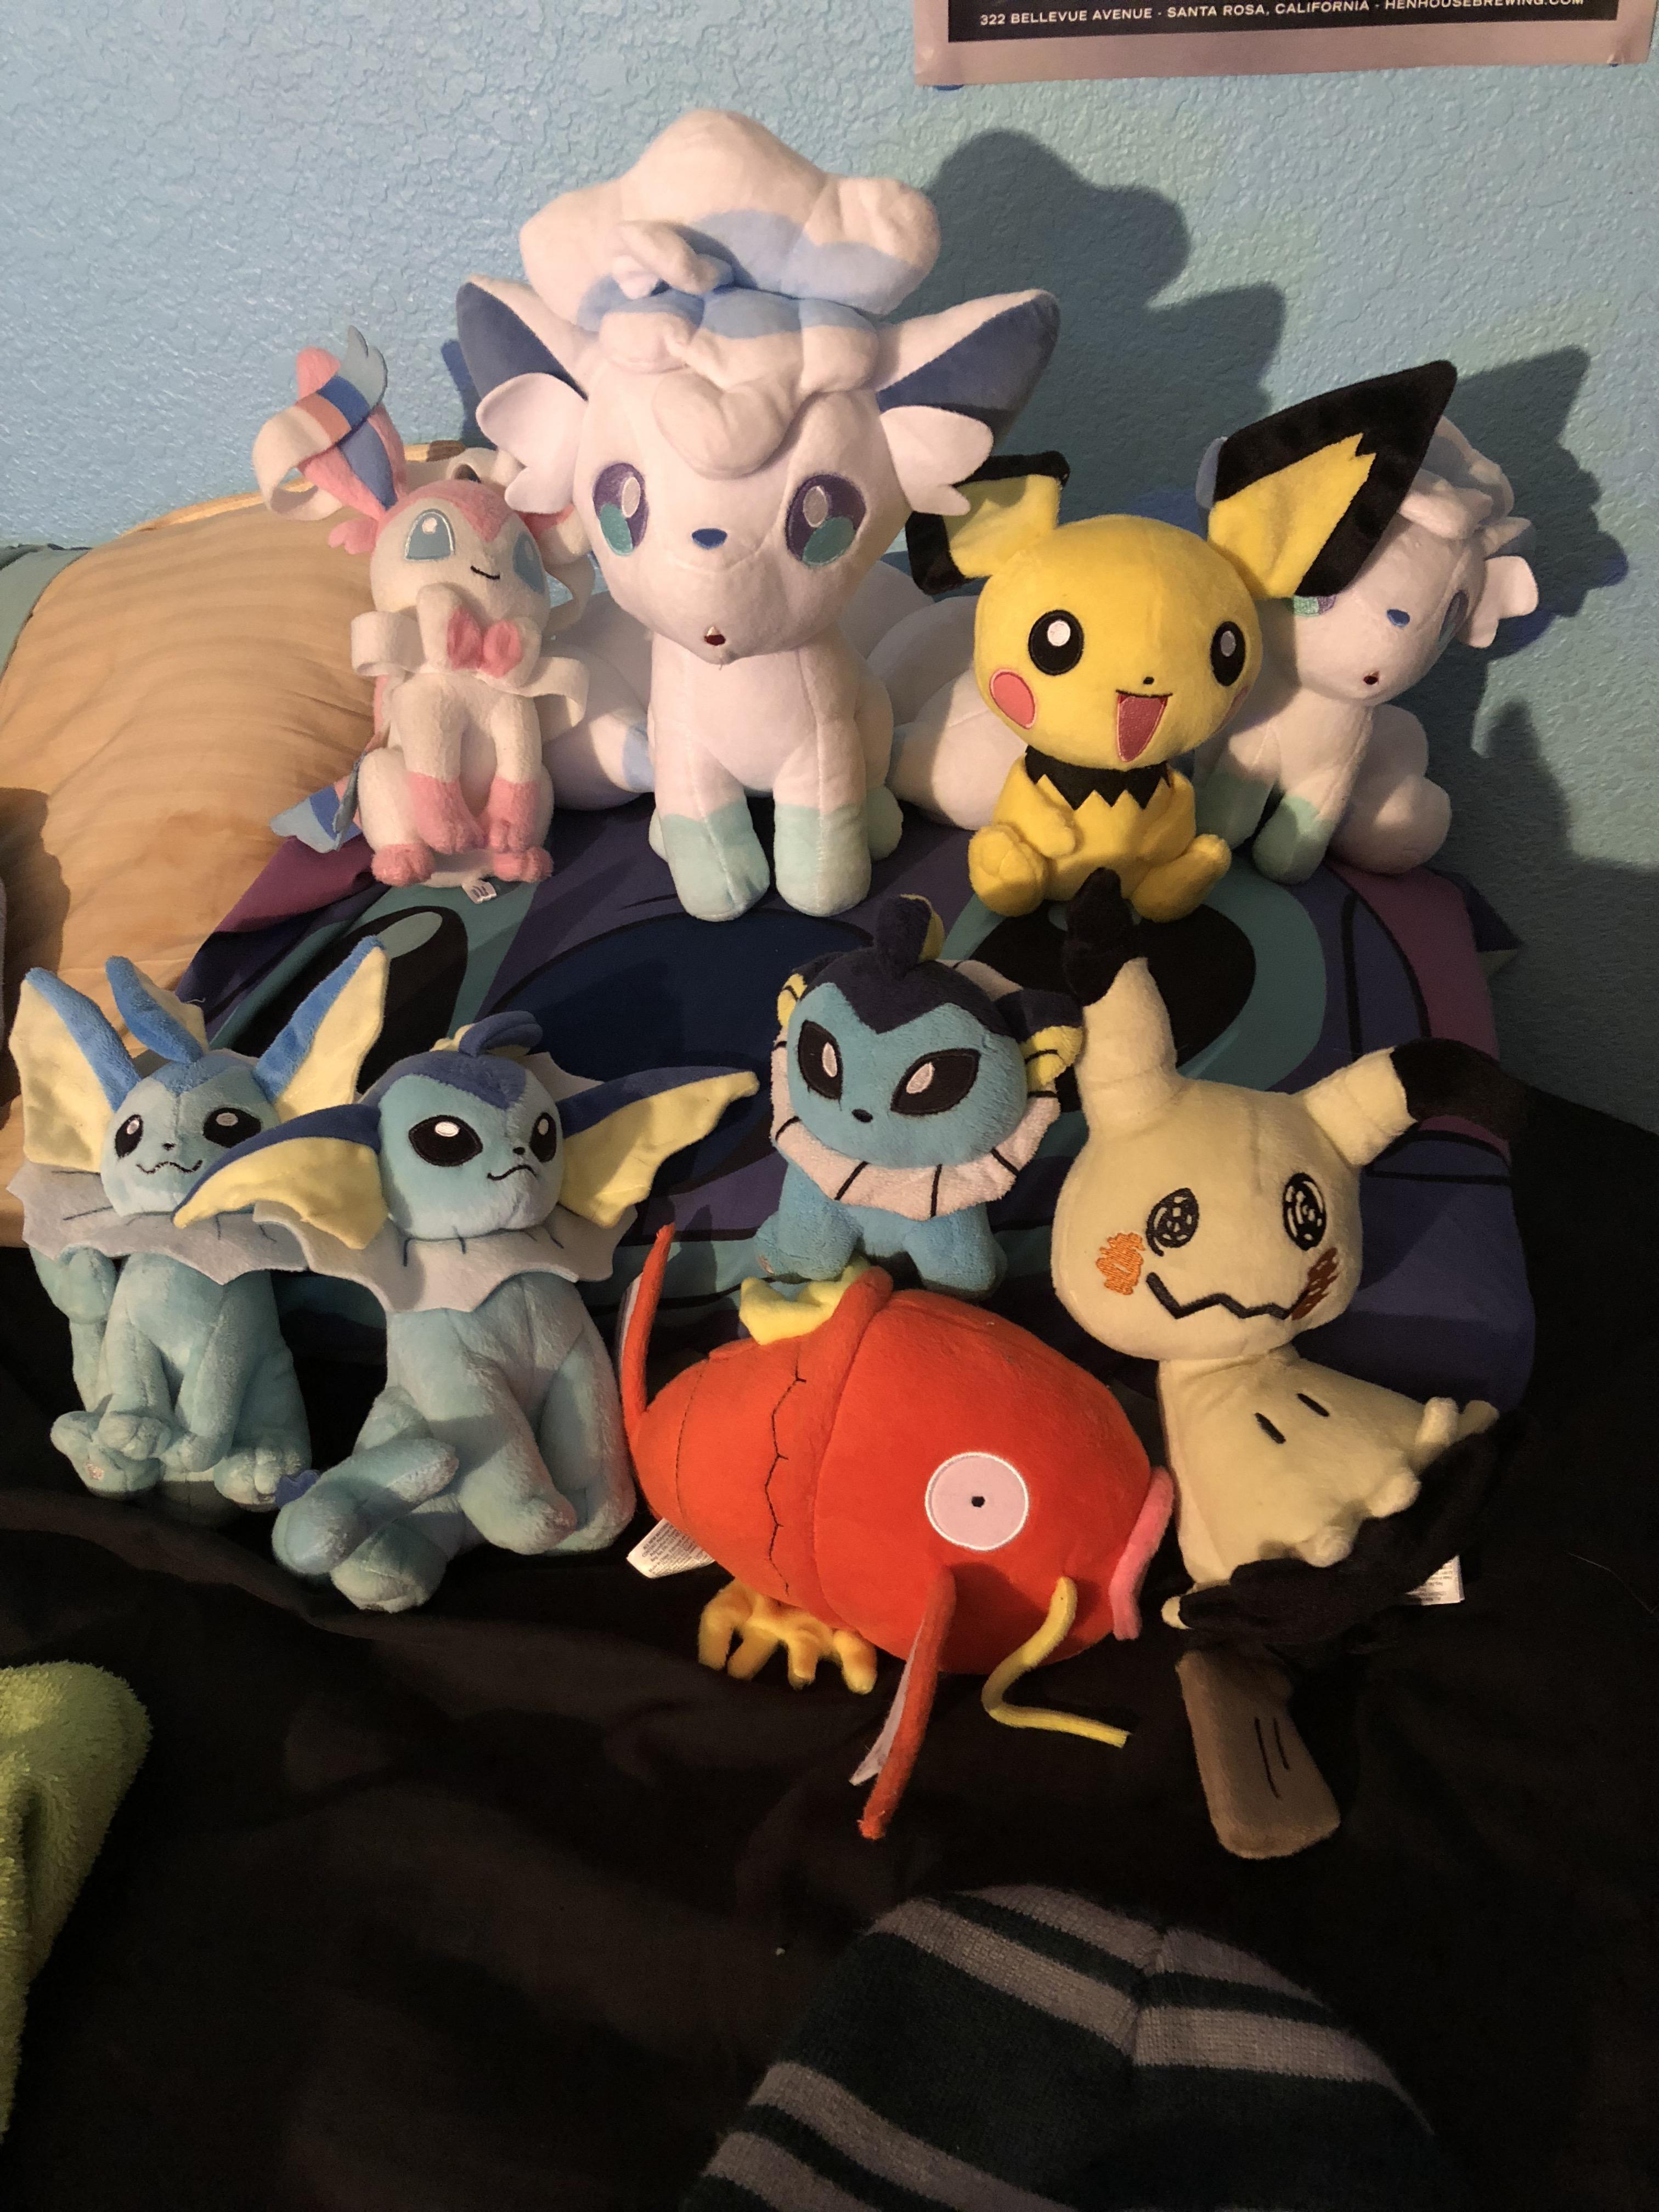 Its apparently my cakeday so enjoy all my Pokémon